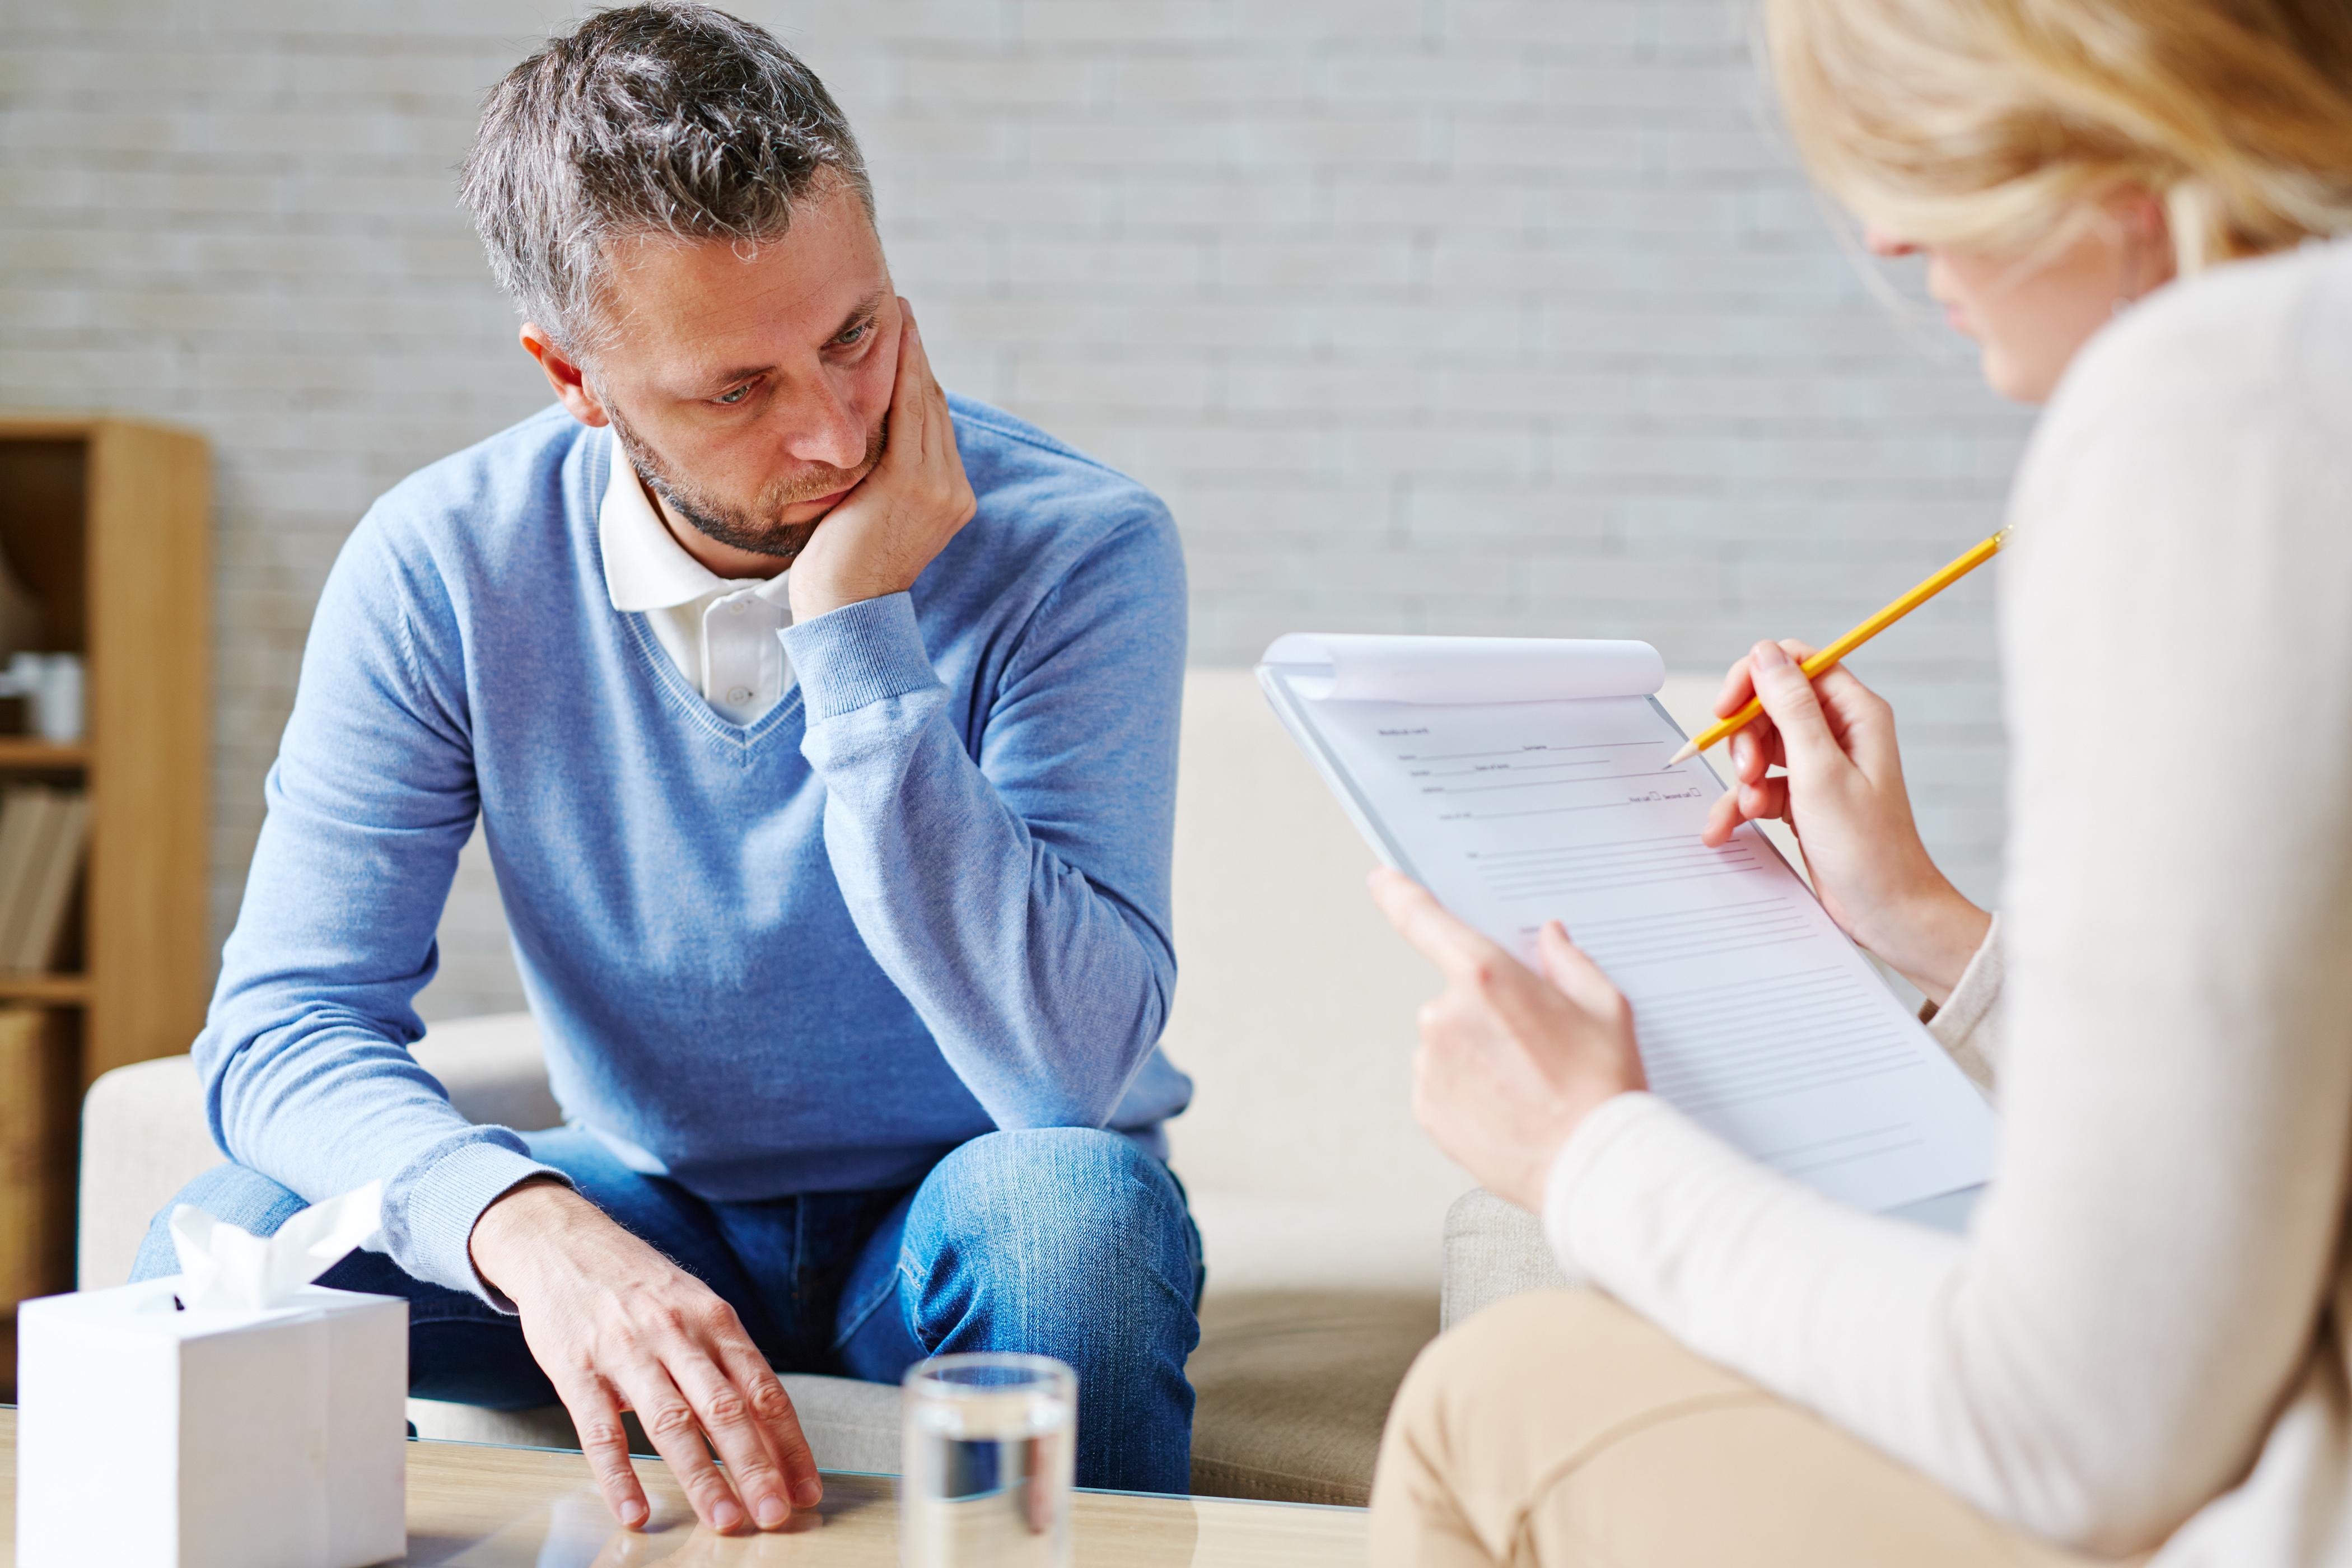 Best New Psychiatry Job Opportunities - Wednesday 10/21